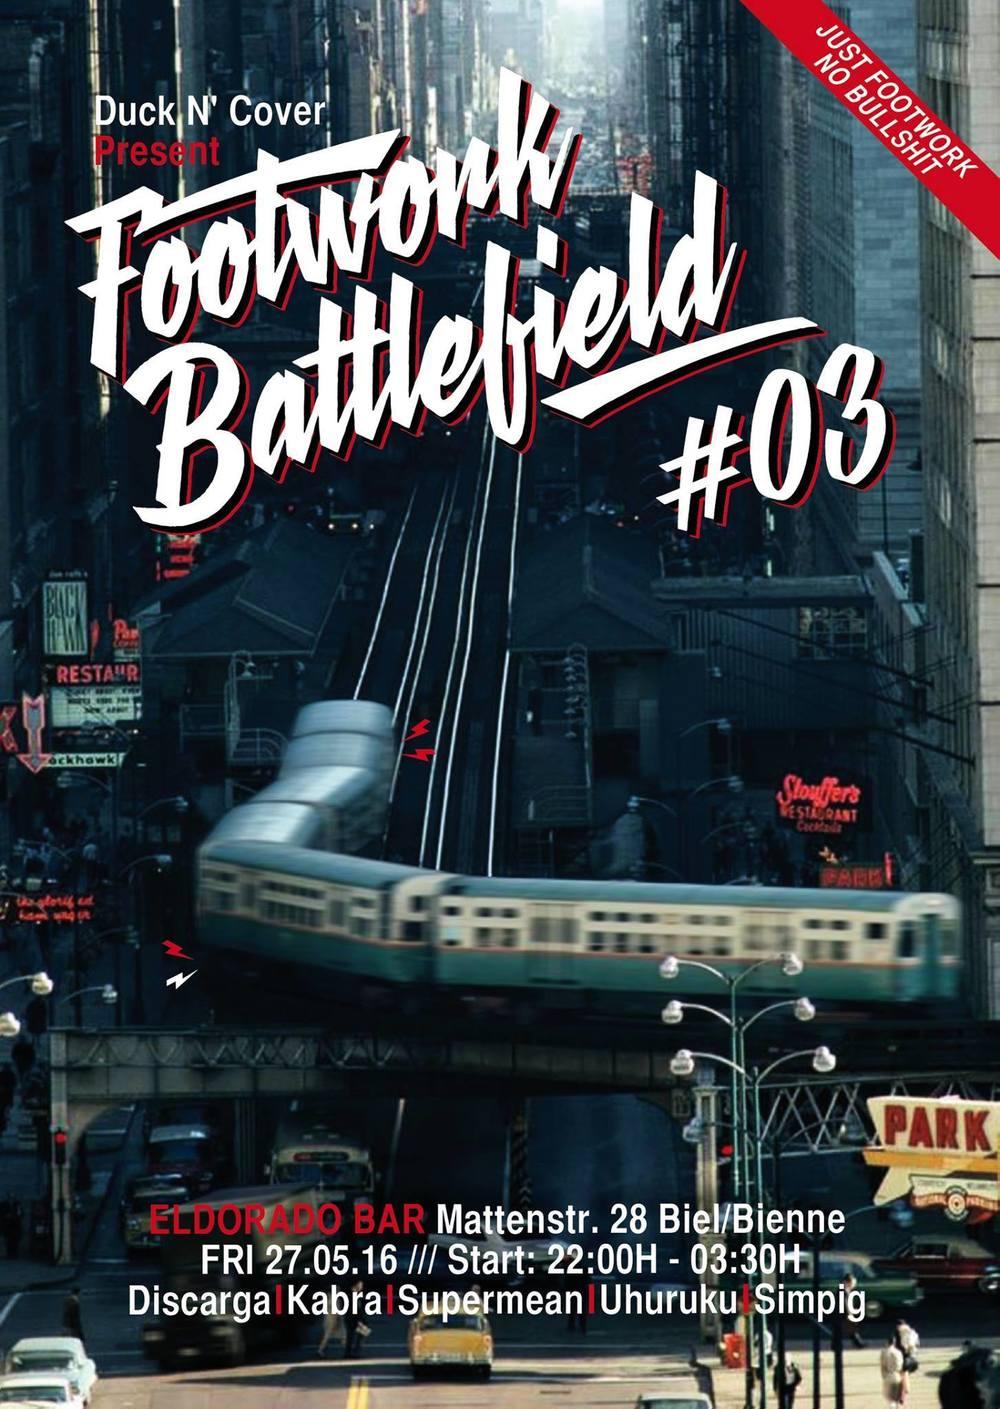 FootworkBattlefield_002